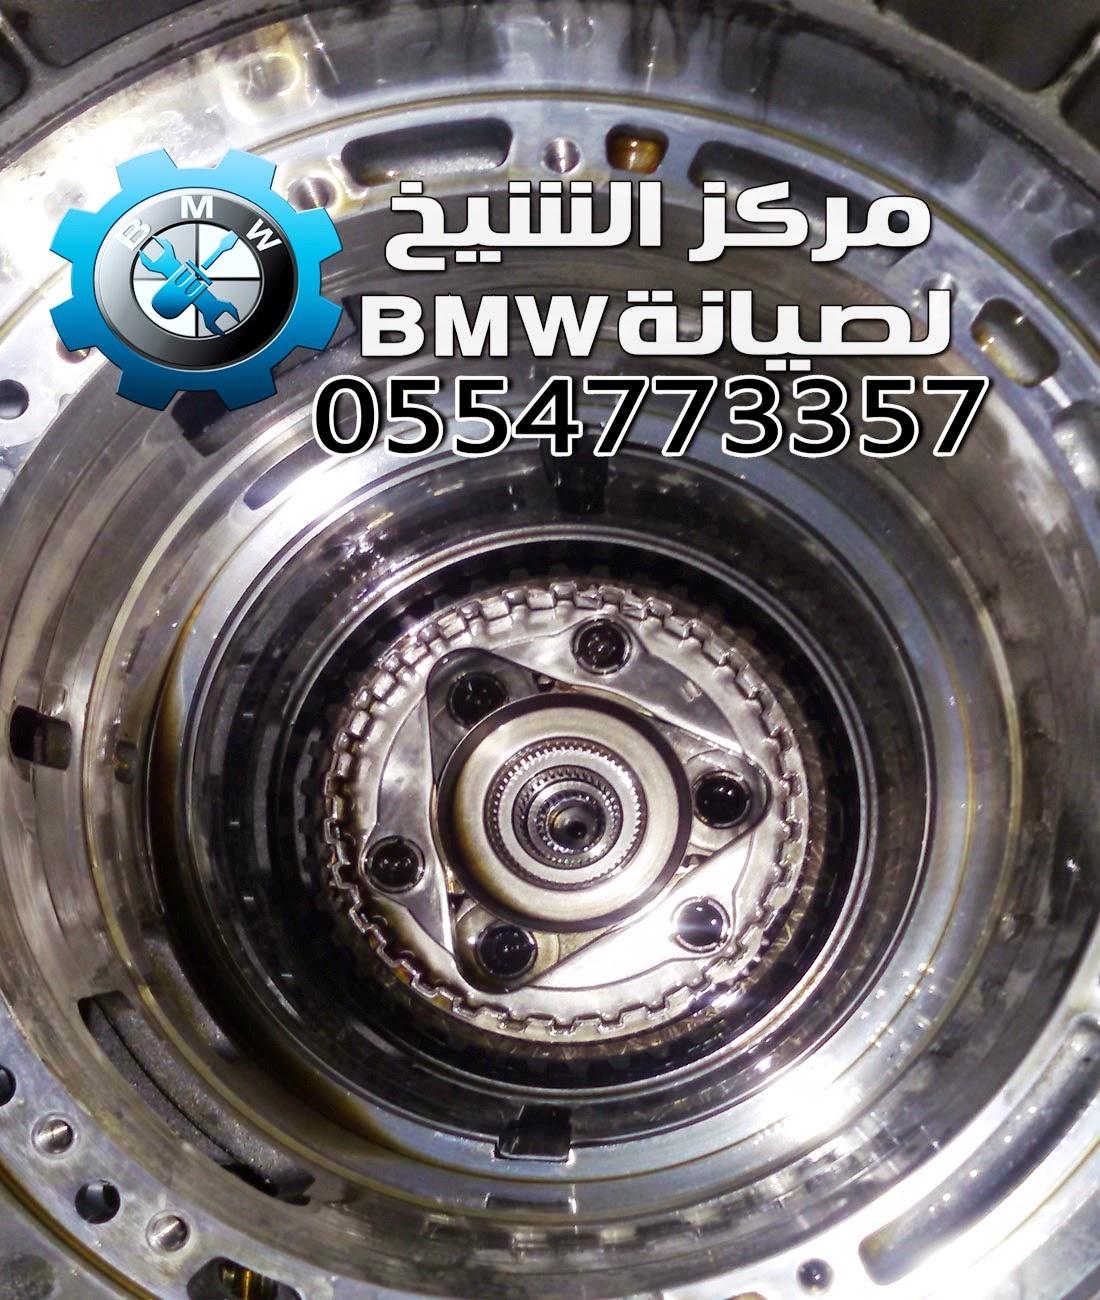 2015 Bmw X5 Transmission: صيانة قير بي ام دبليو مع الضمان